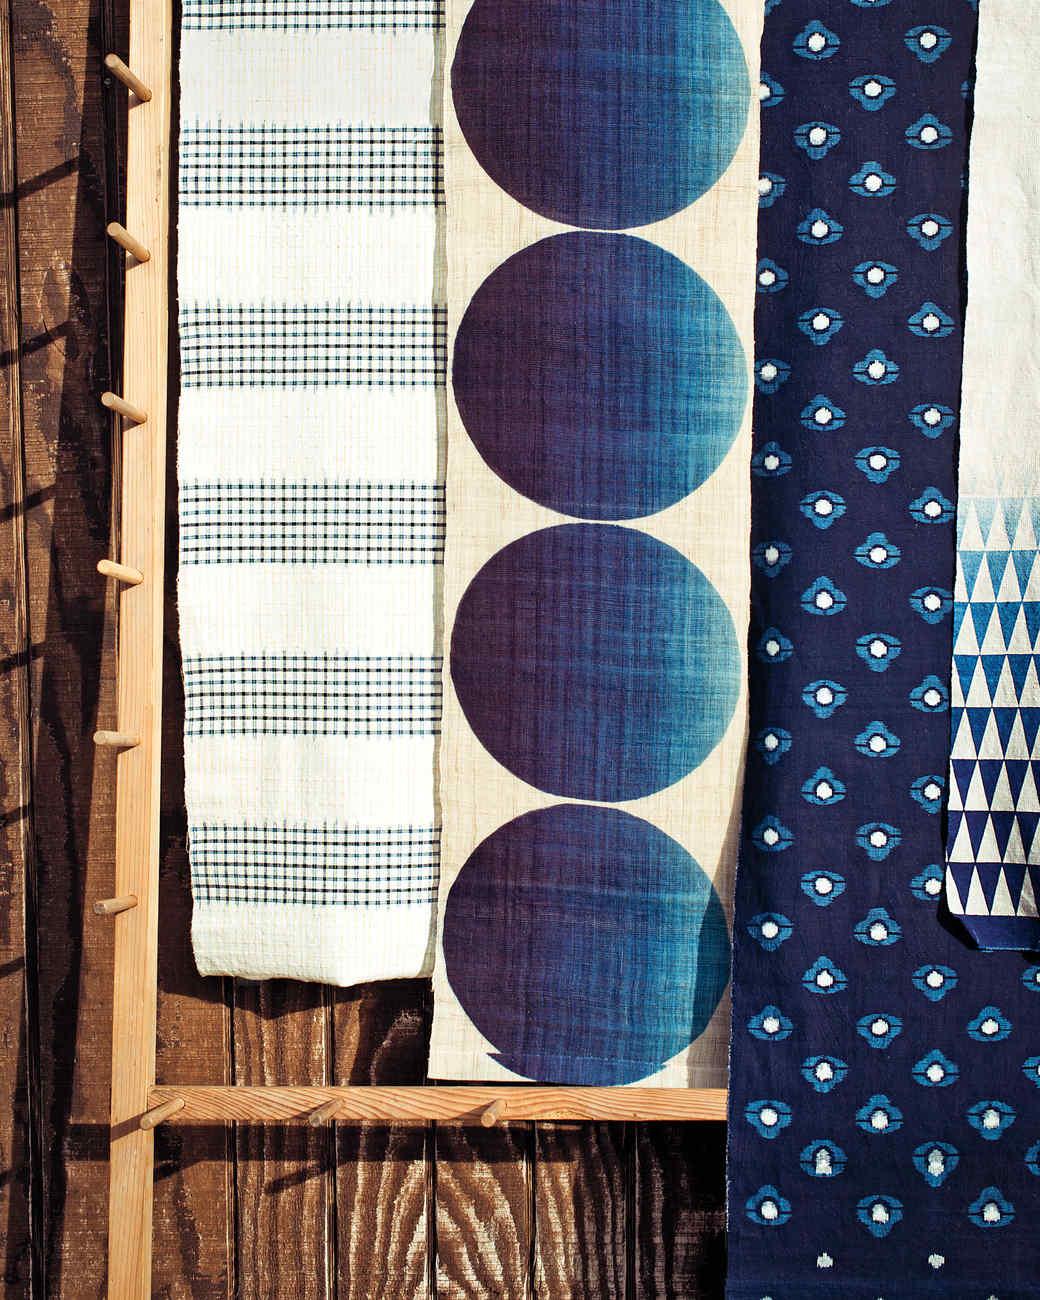 american-made-ricketts-indigo-056-d111684.jpg